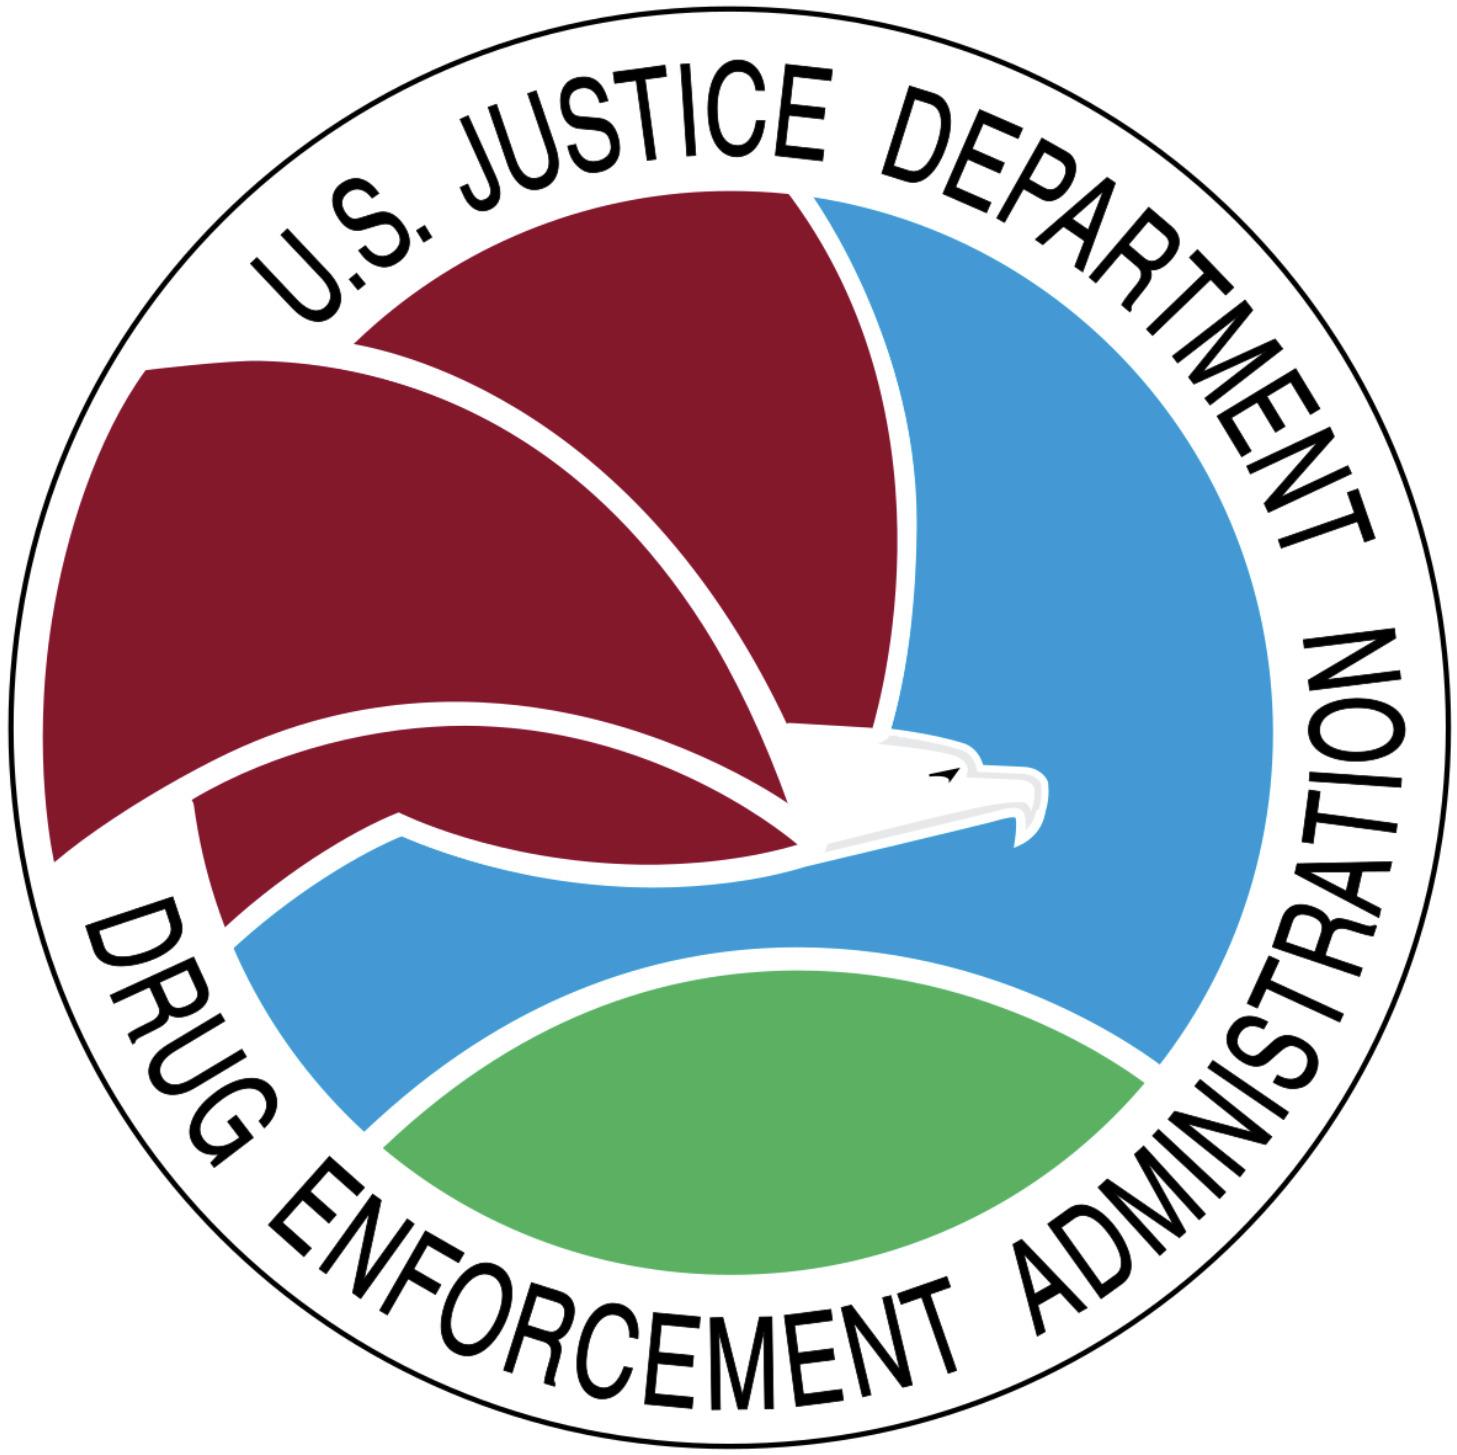 Drug Enforcement Administration | U.S. Department of Justice | Diversion Control Division